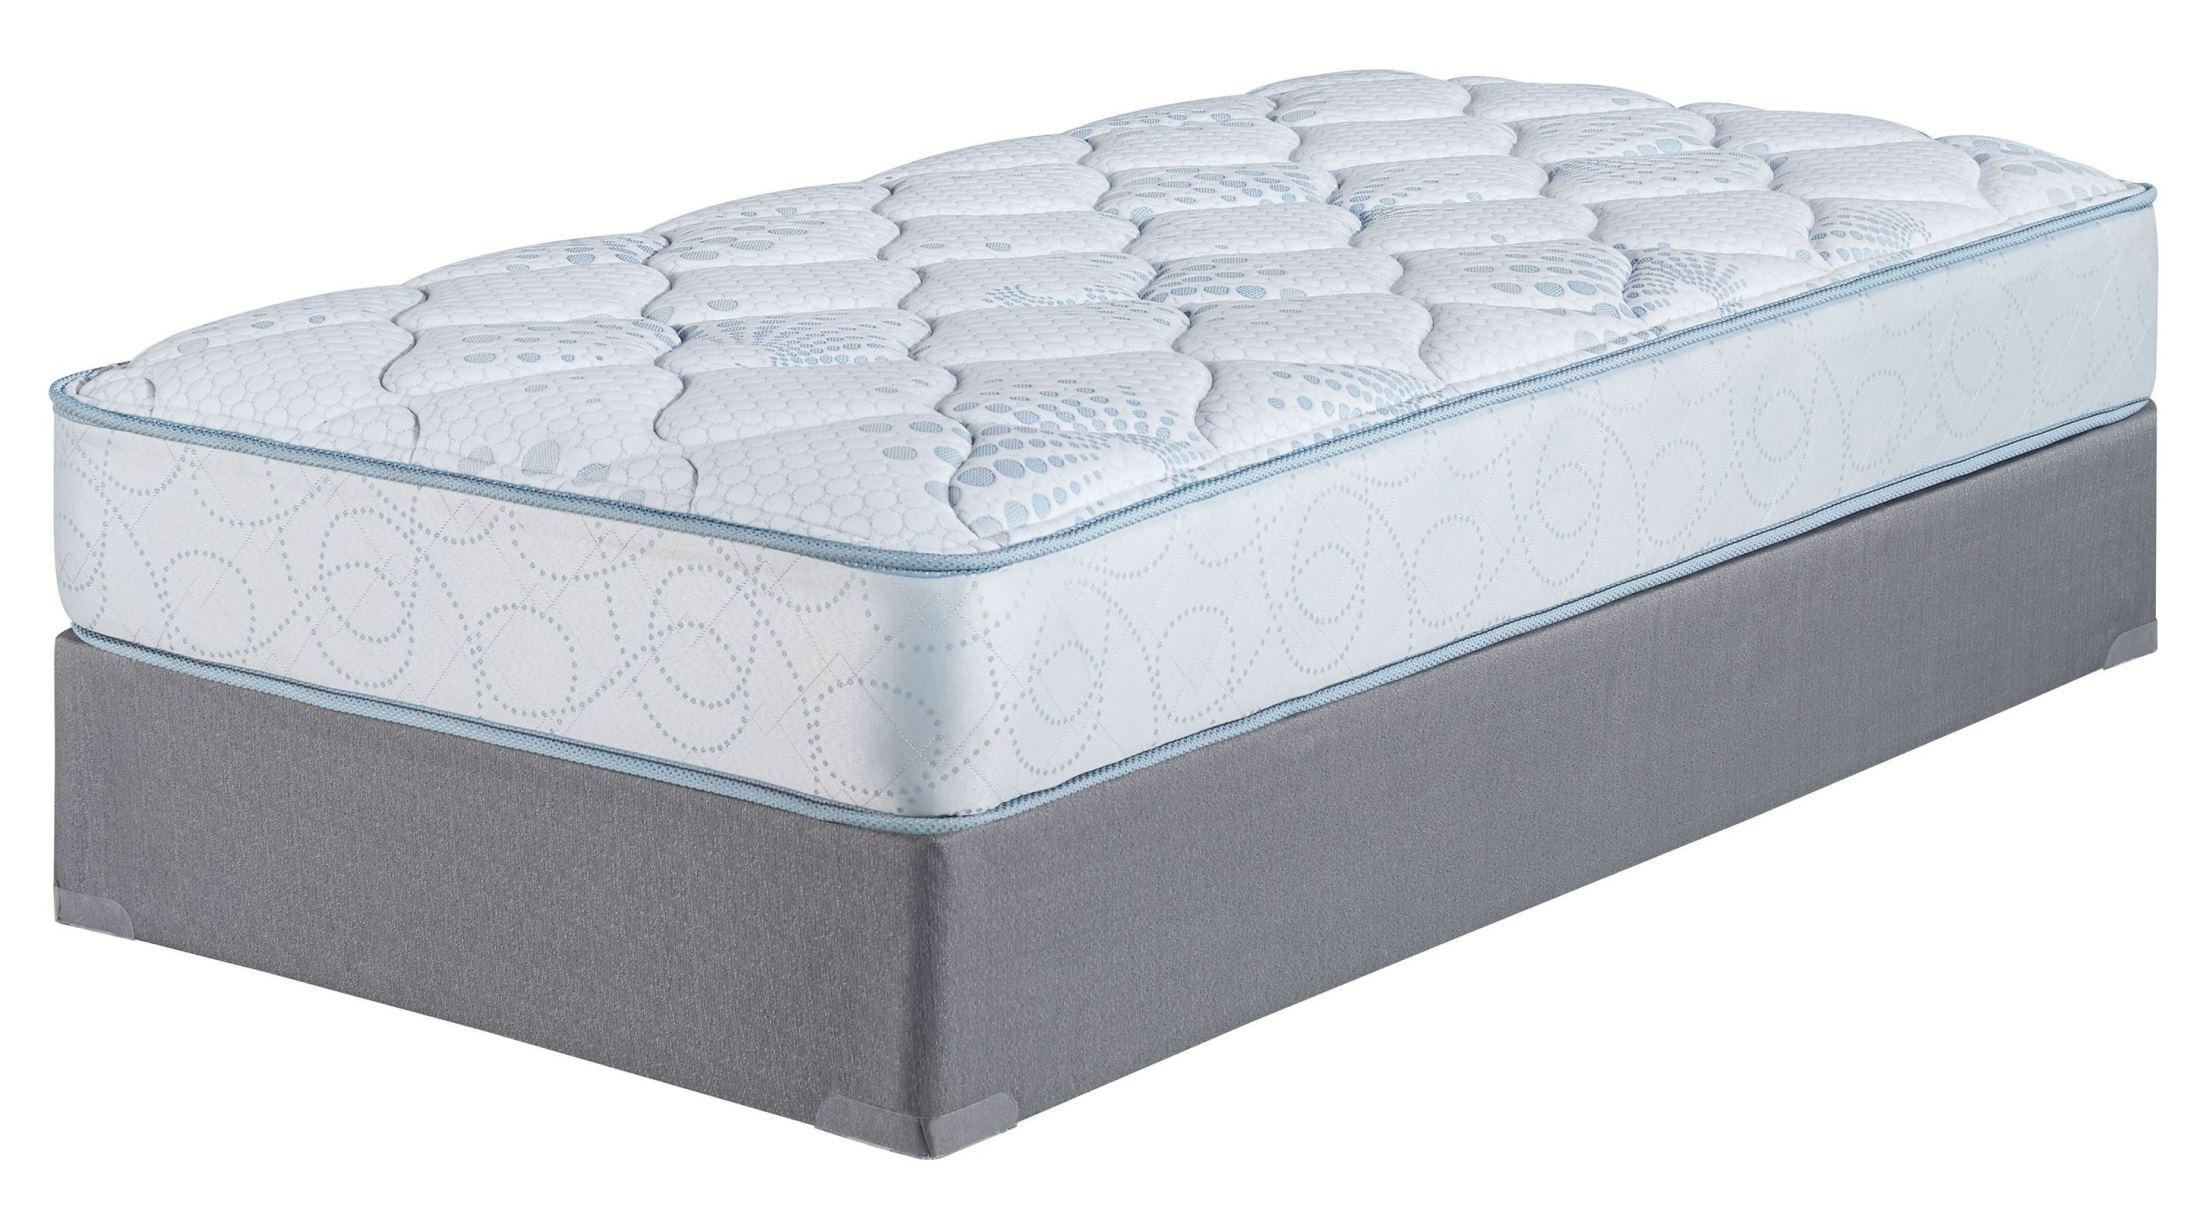 kids bedding innerspring full size mattress from ashley coleman furniture. Black Bedroom Furniture Sets. Home Design Ideas